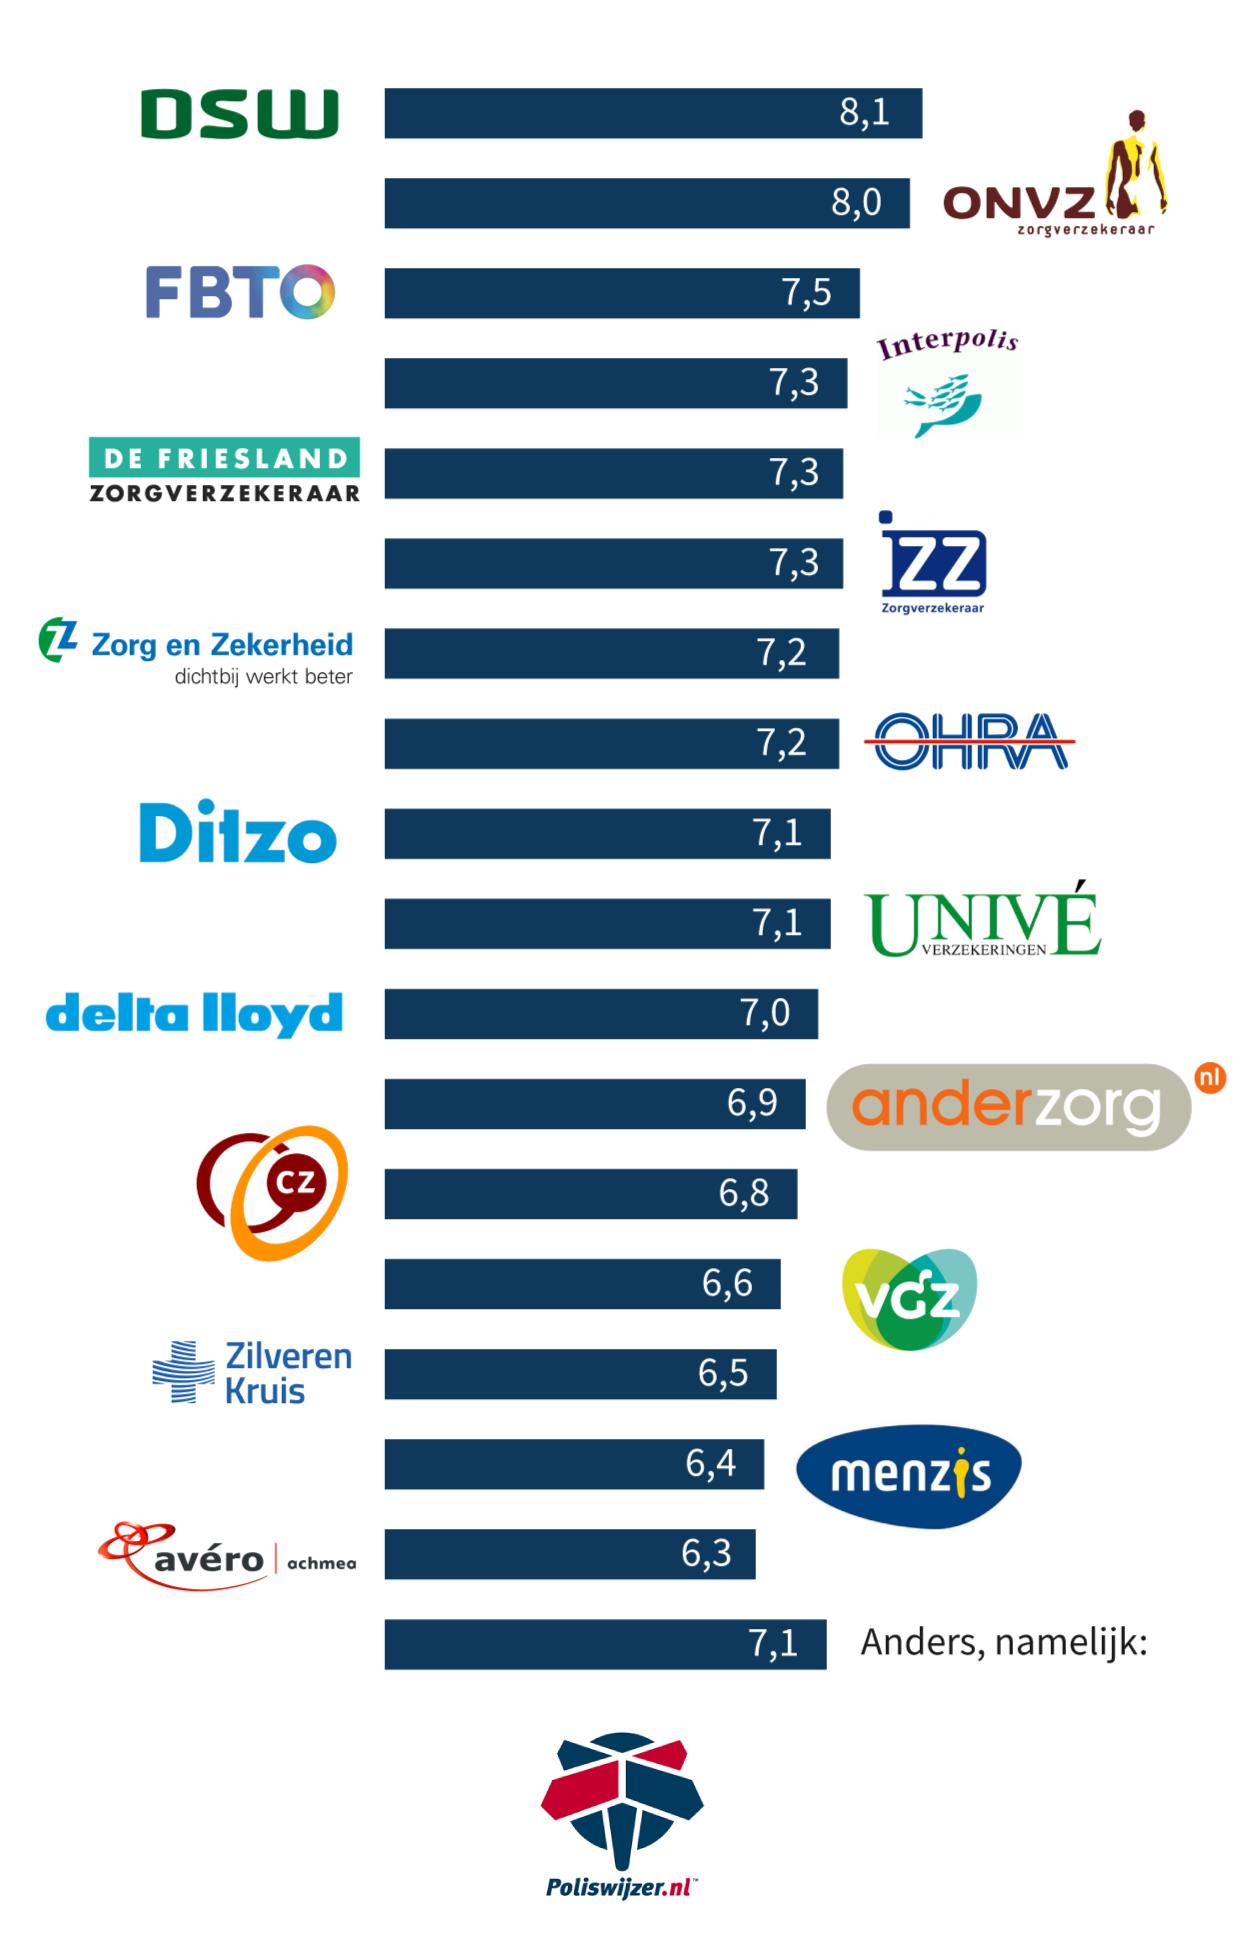 Movital Nieuwe 2019 Nieuwe Zorgverzekering Movital Nieuwe Zorgverzekering Keuze Keuze 2019 Keuze SMVqUpz